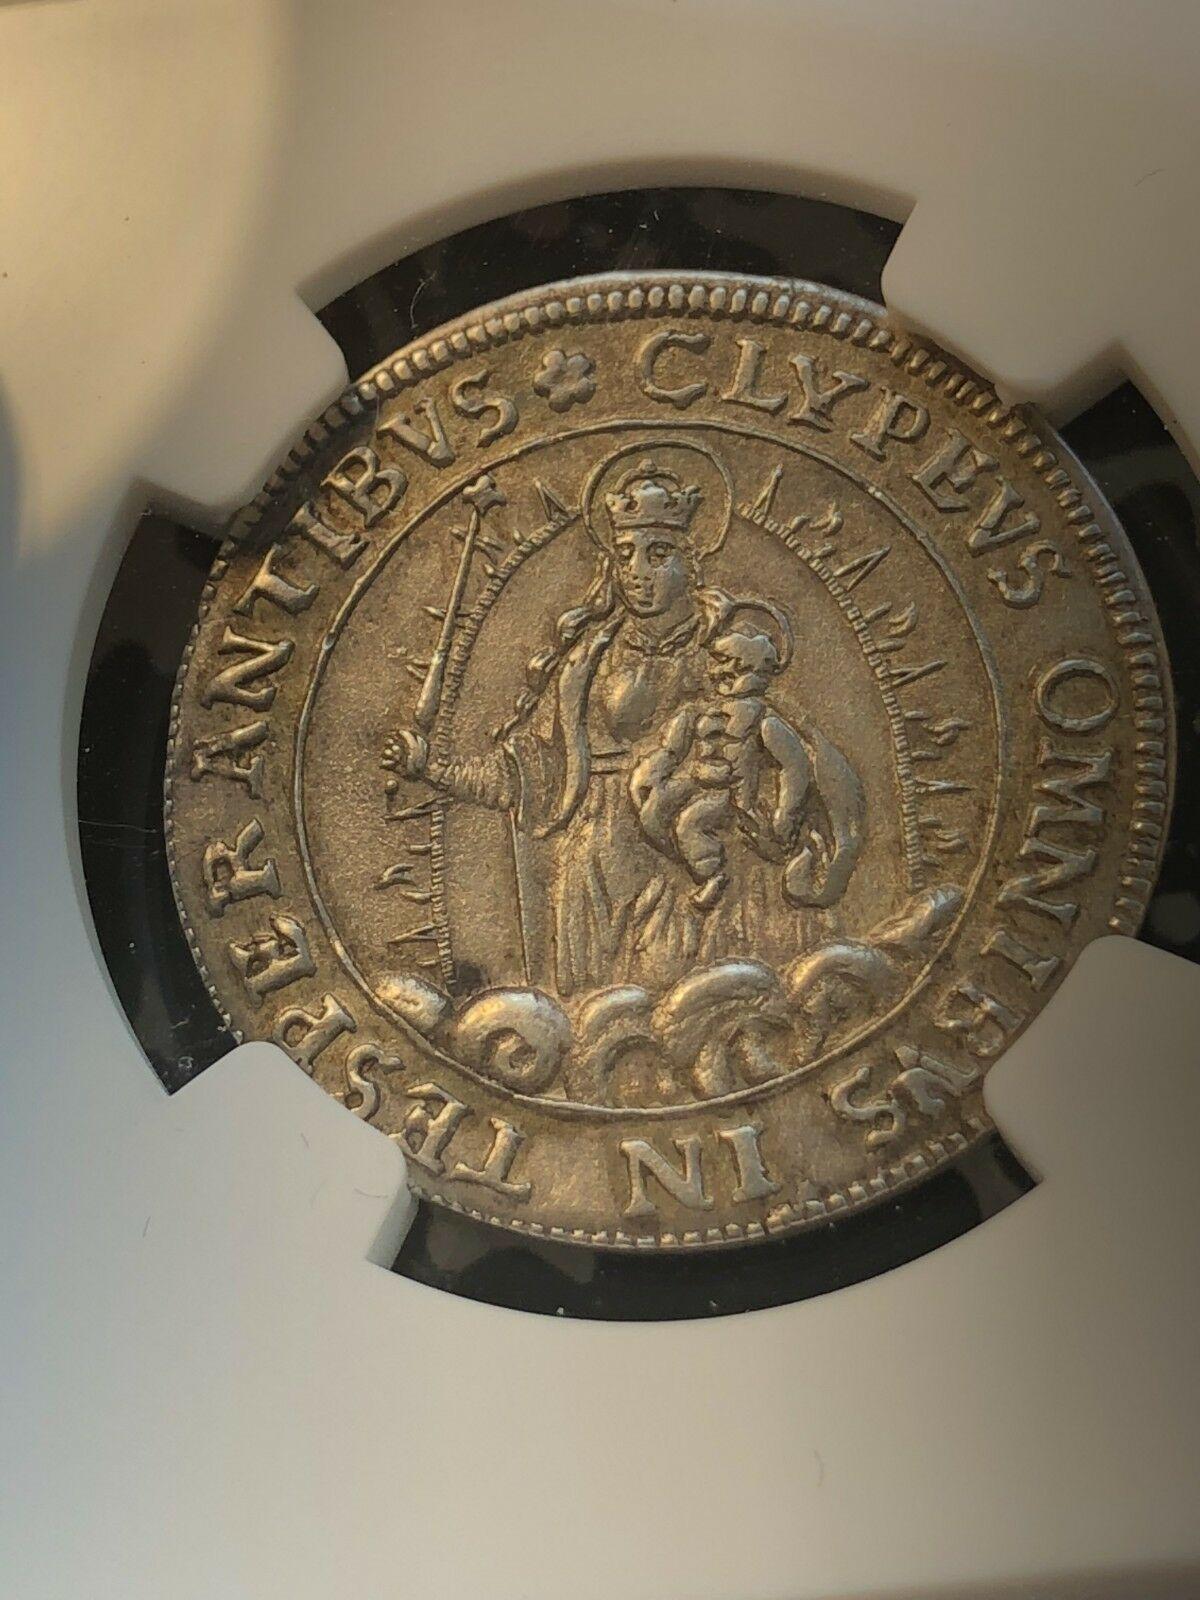 (1623) Alemán Estados Baviera 1/6 Thaler de Plata ! NGC Au58 #G996 Madonna &